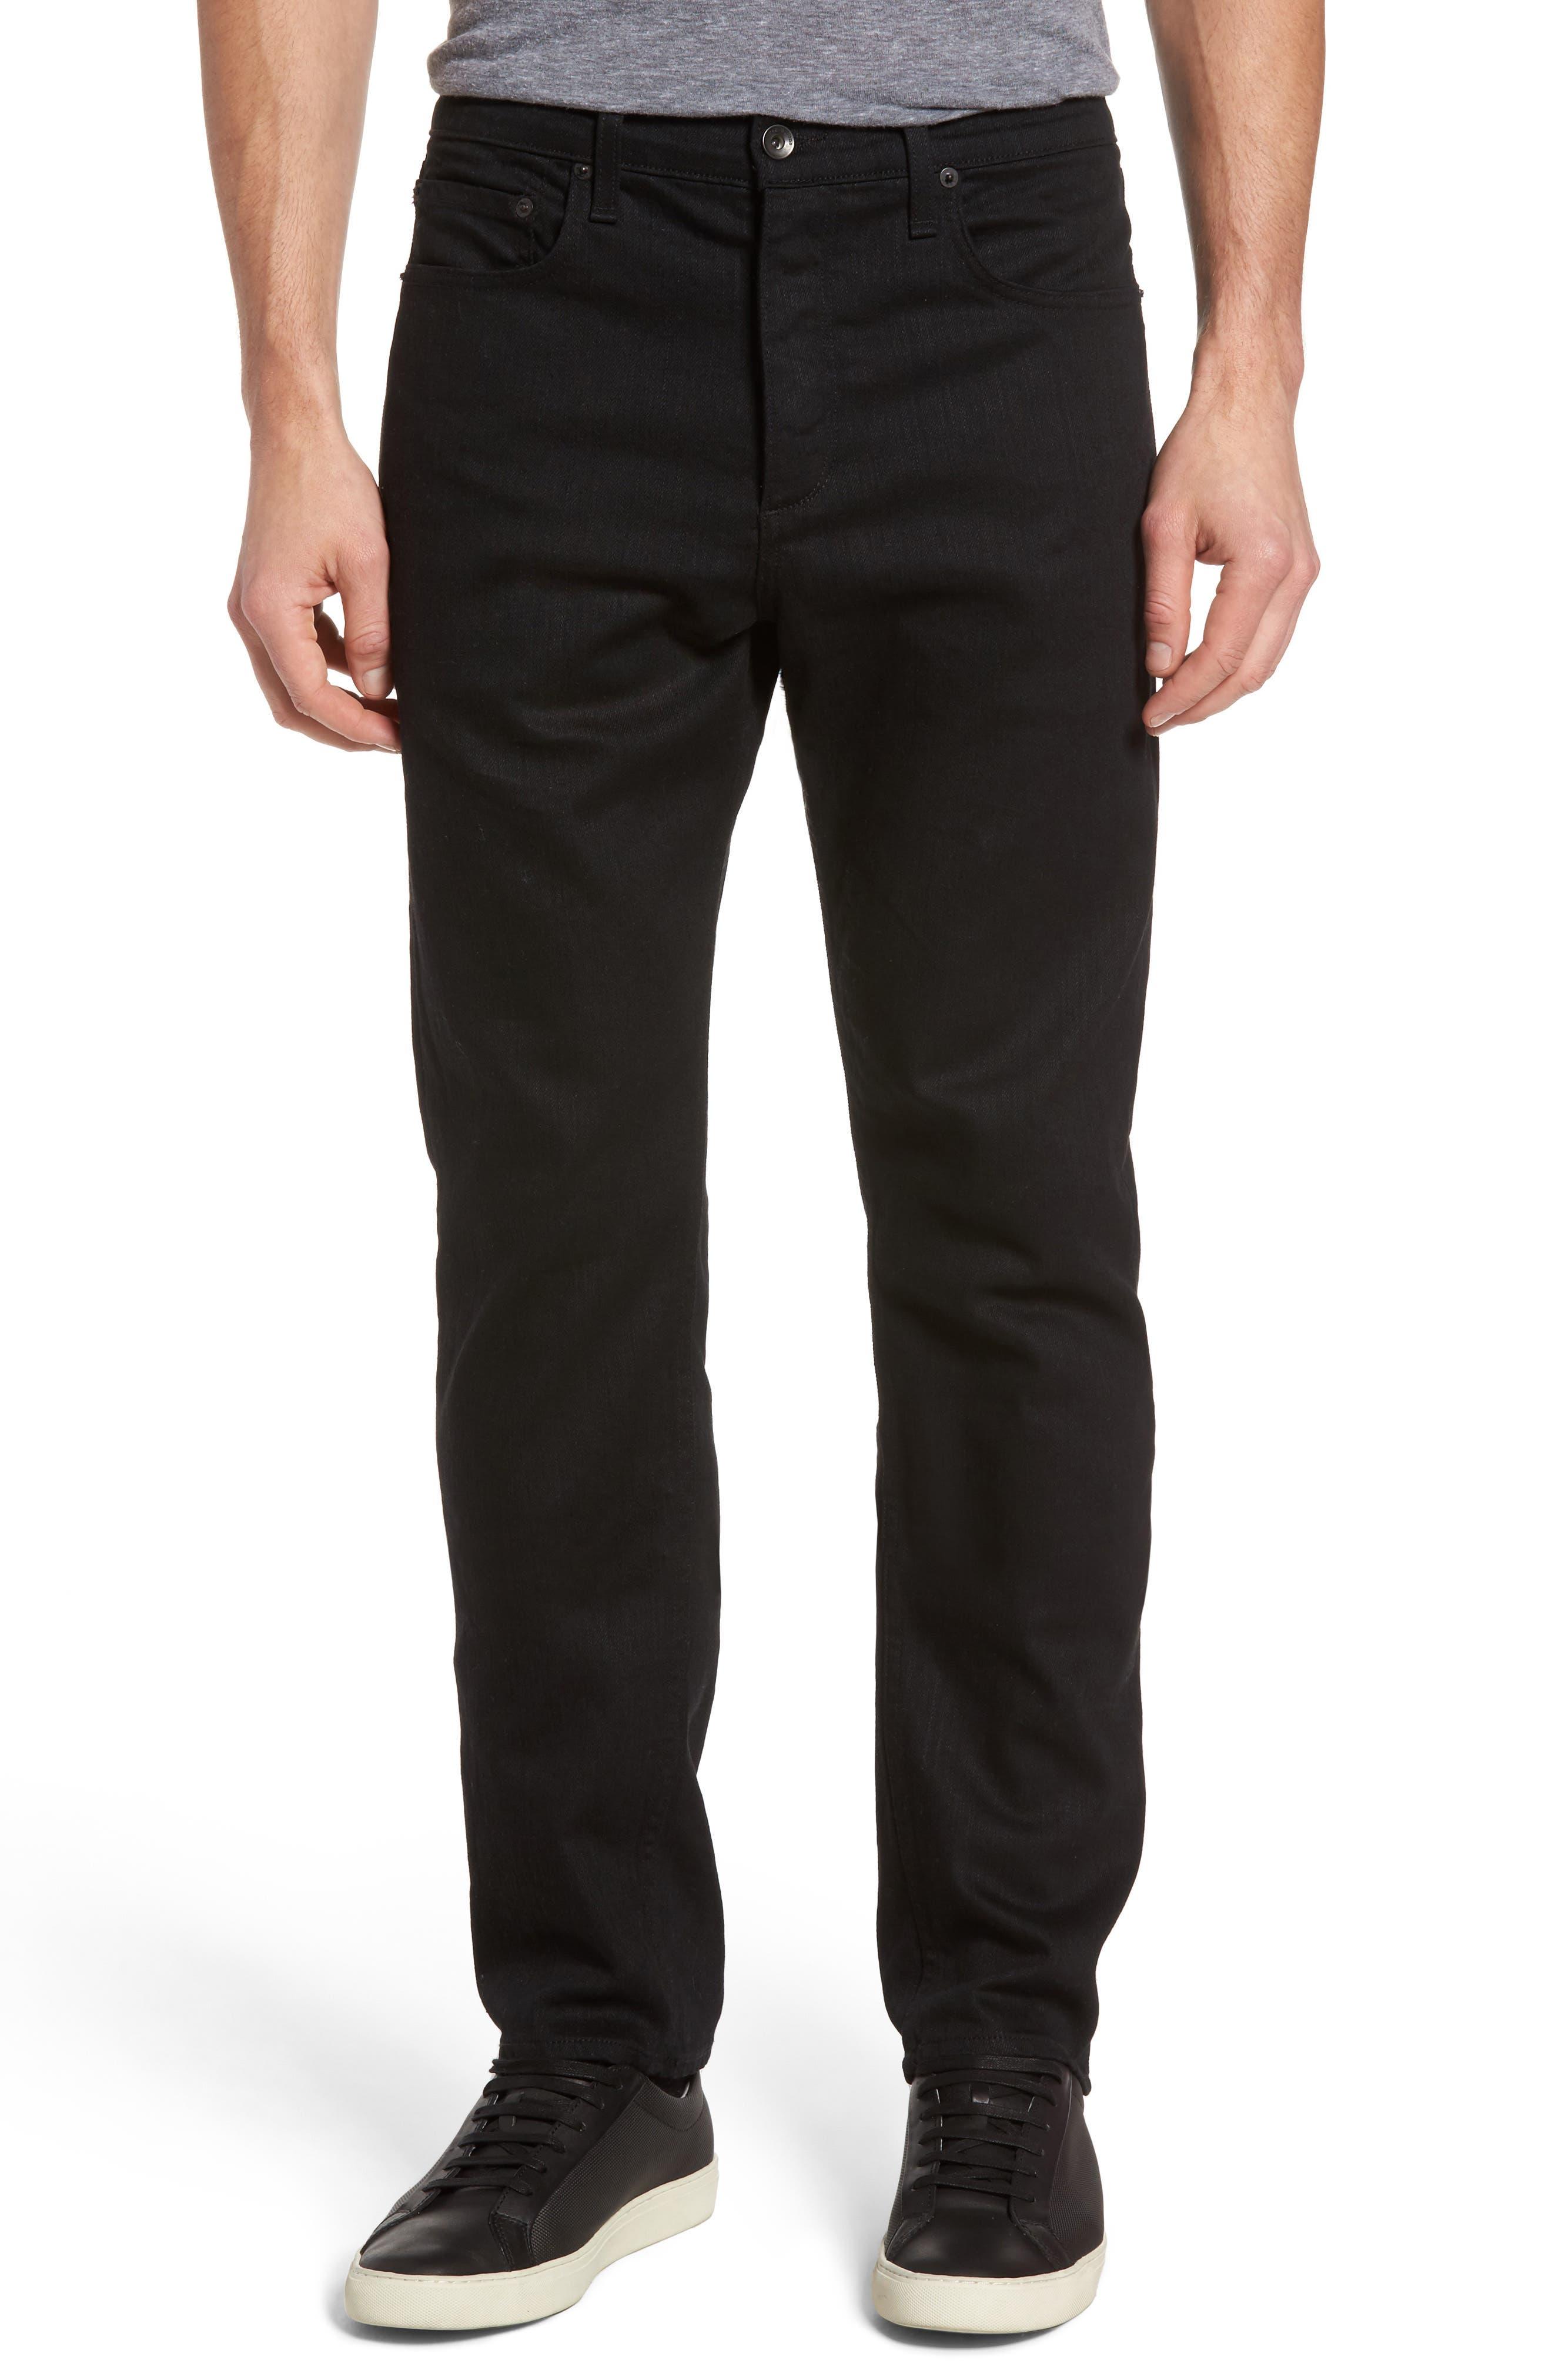 Alternate Image 1 Selected - rag & bone Fit 3 Slim Straight Leg Jeans